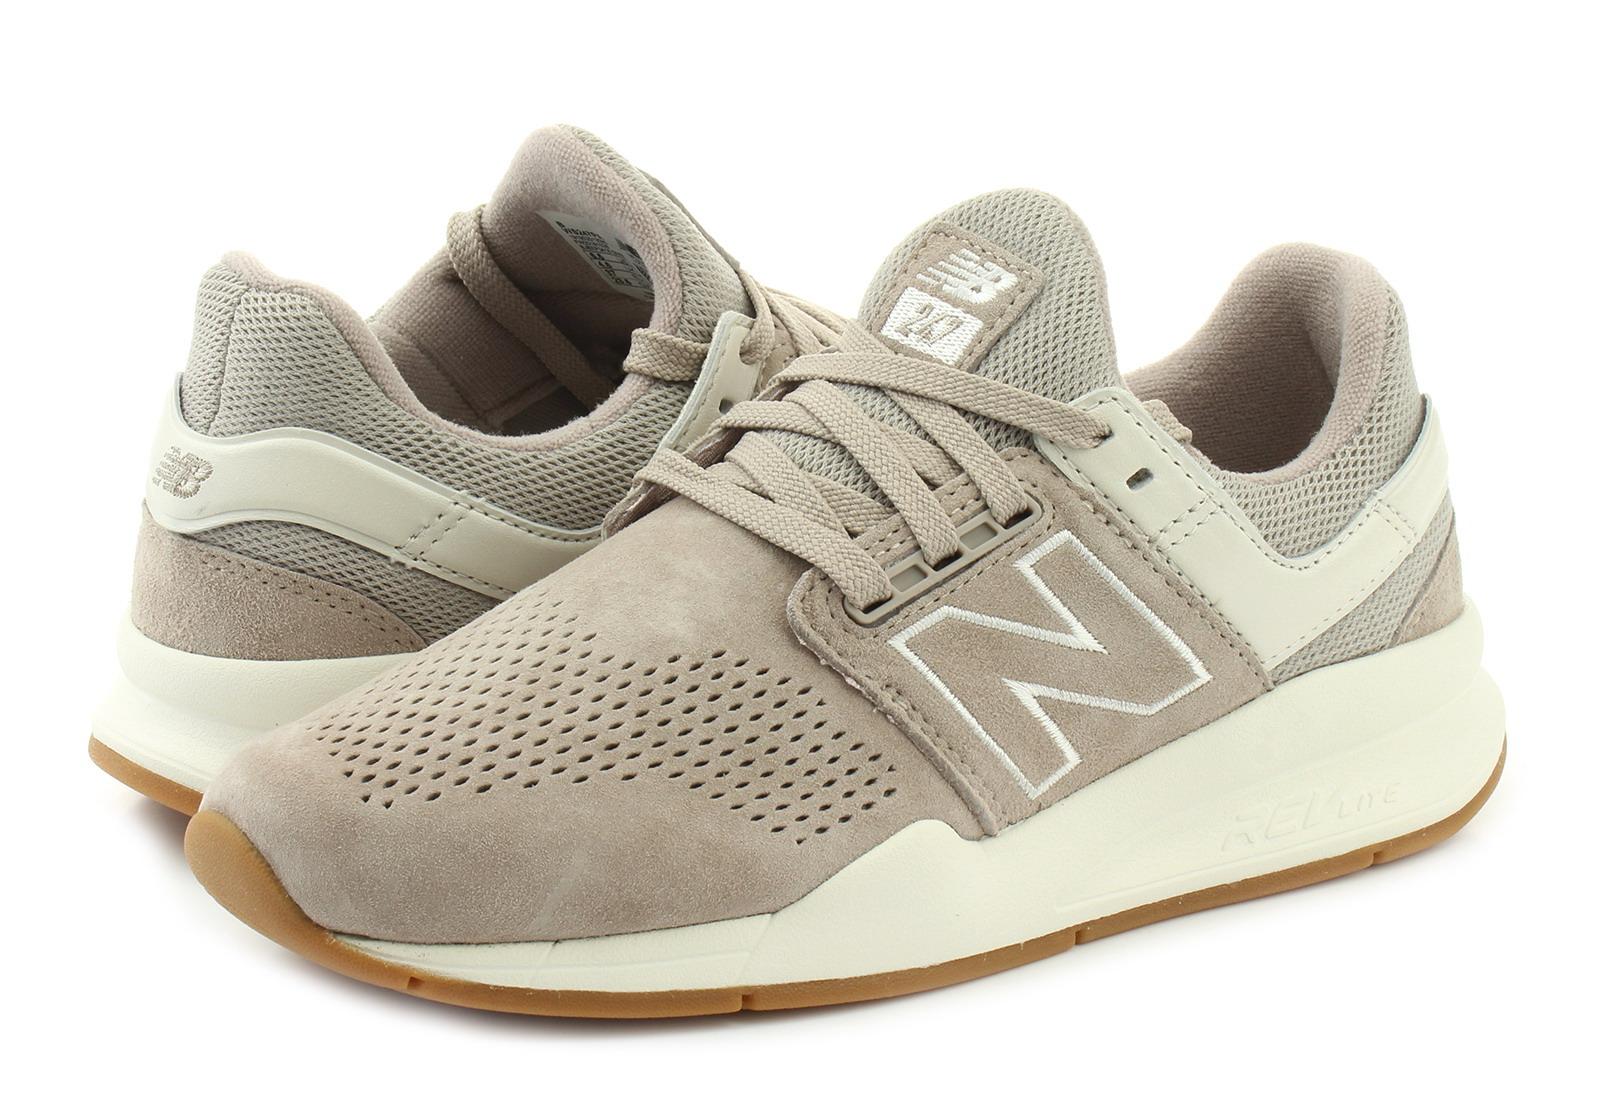 New Balance Cipő - Ws247 - WS247PA - Office Shoes Magyarország 19e4b1dbd0